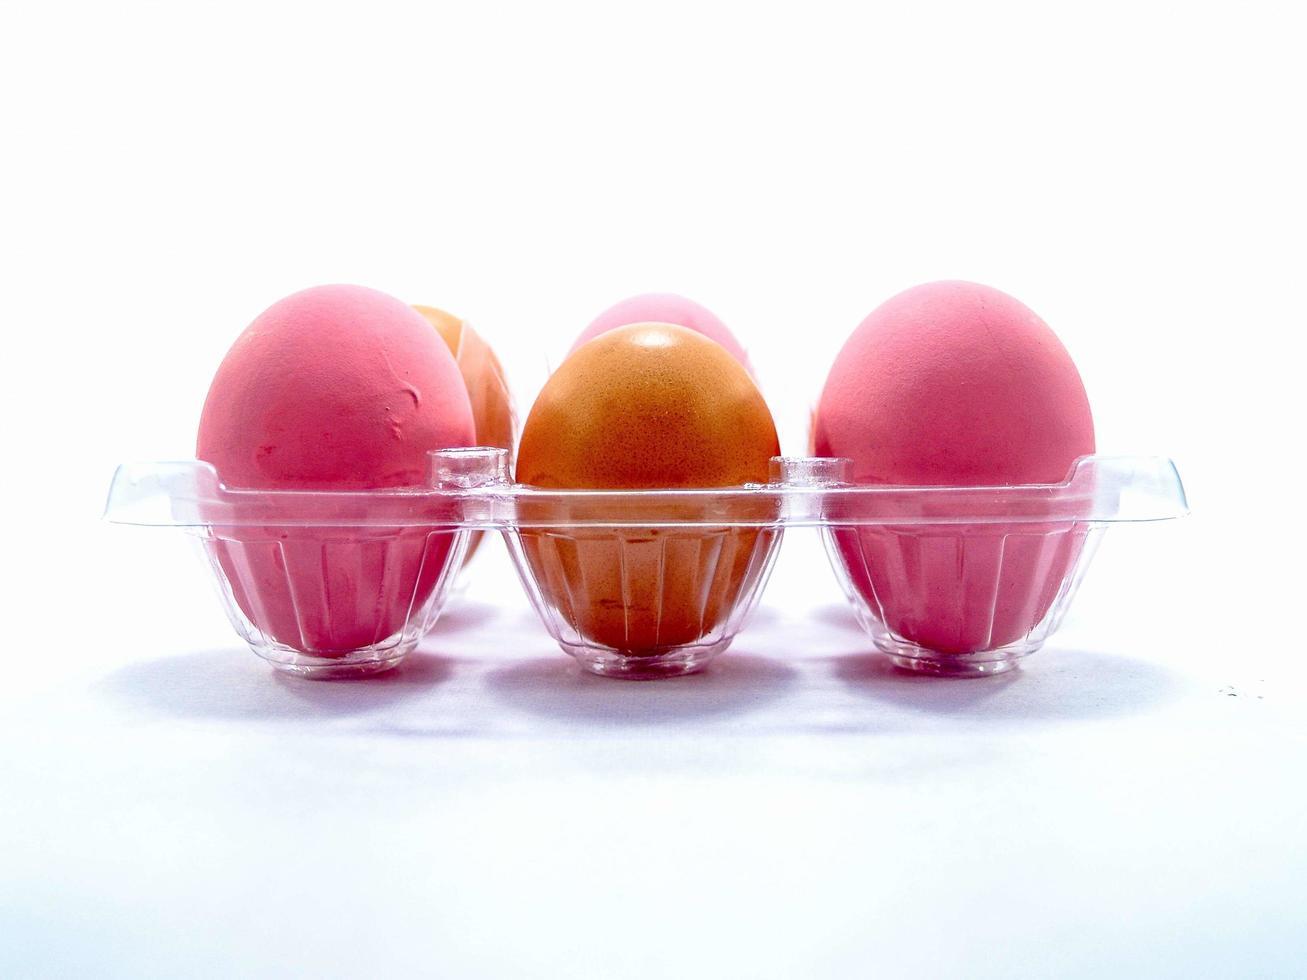 vista ravvicinata di uova crude foto